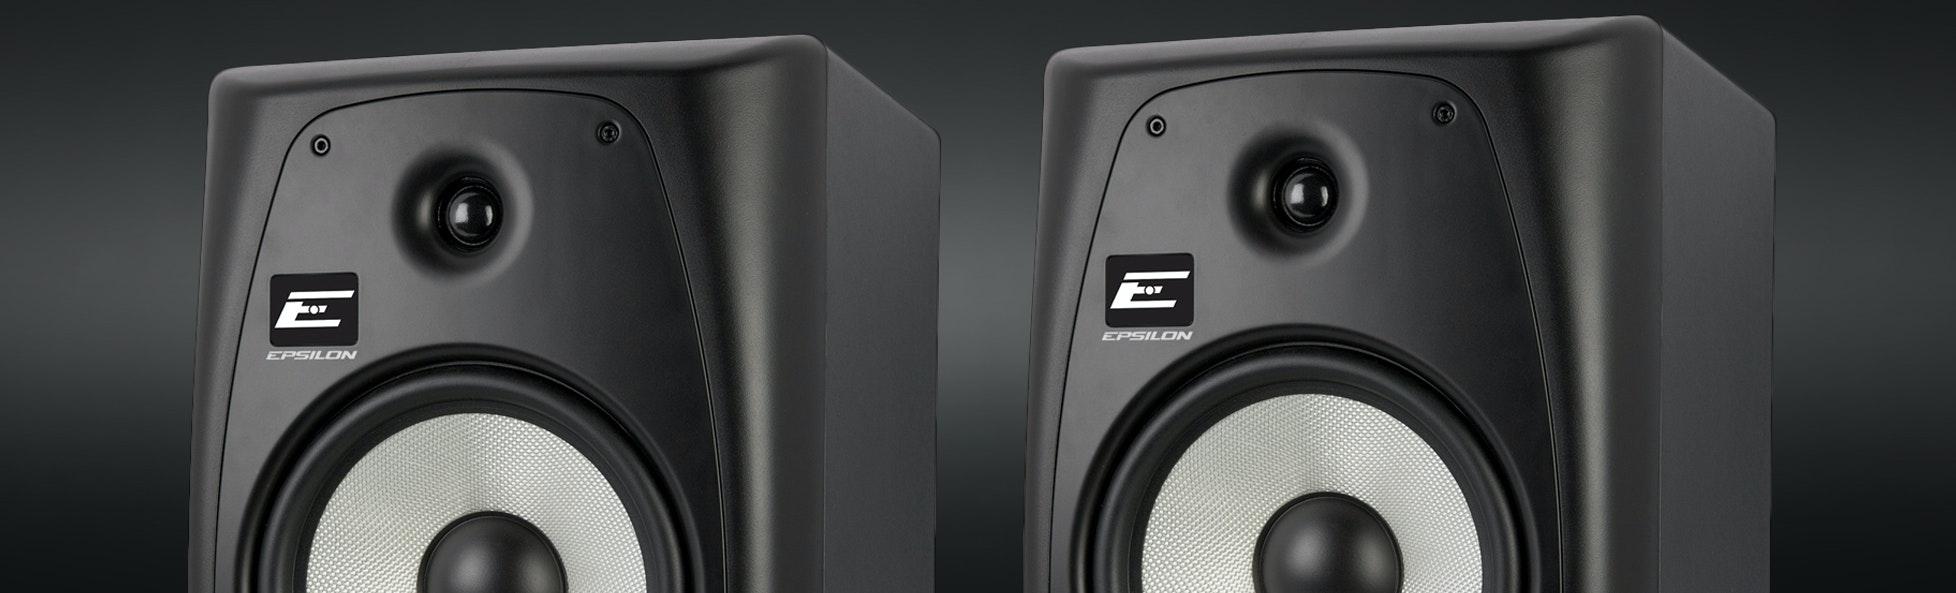 Epsilon EPM-8.0 Powered Studio Monitor